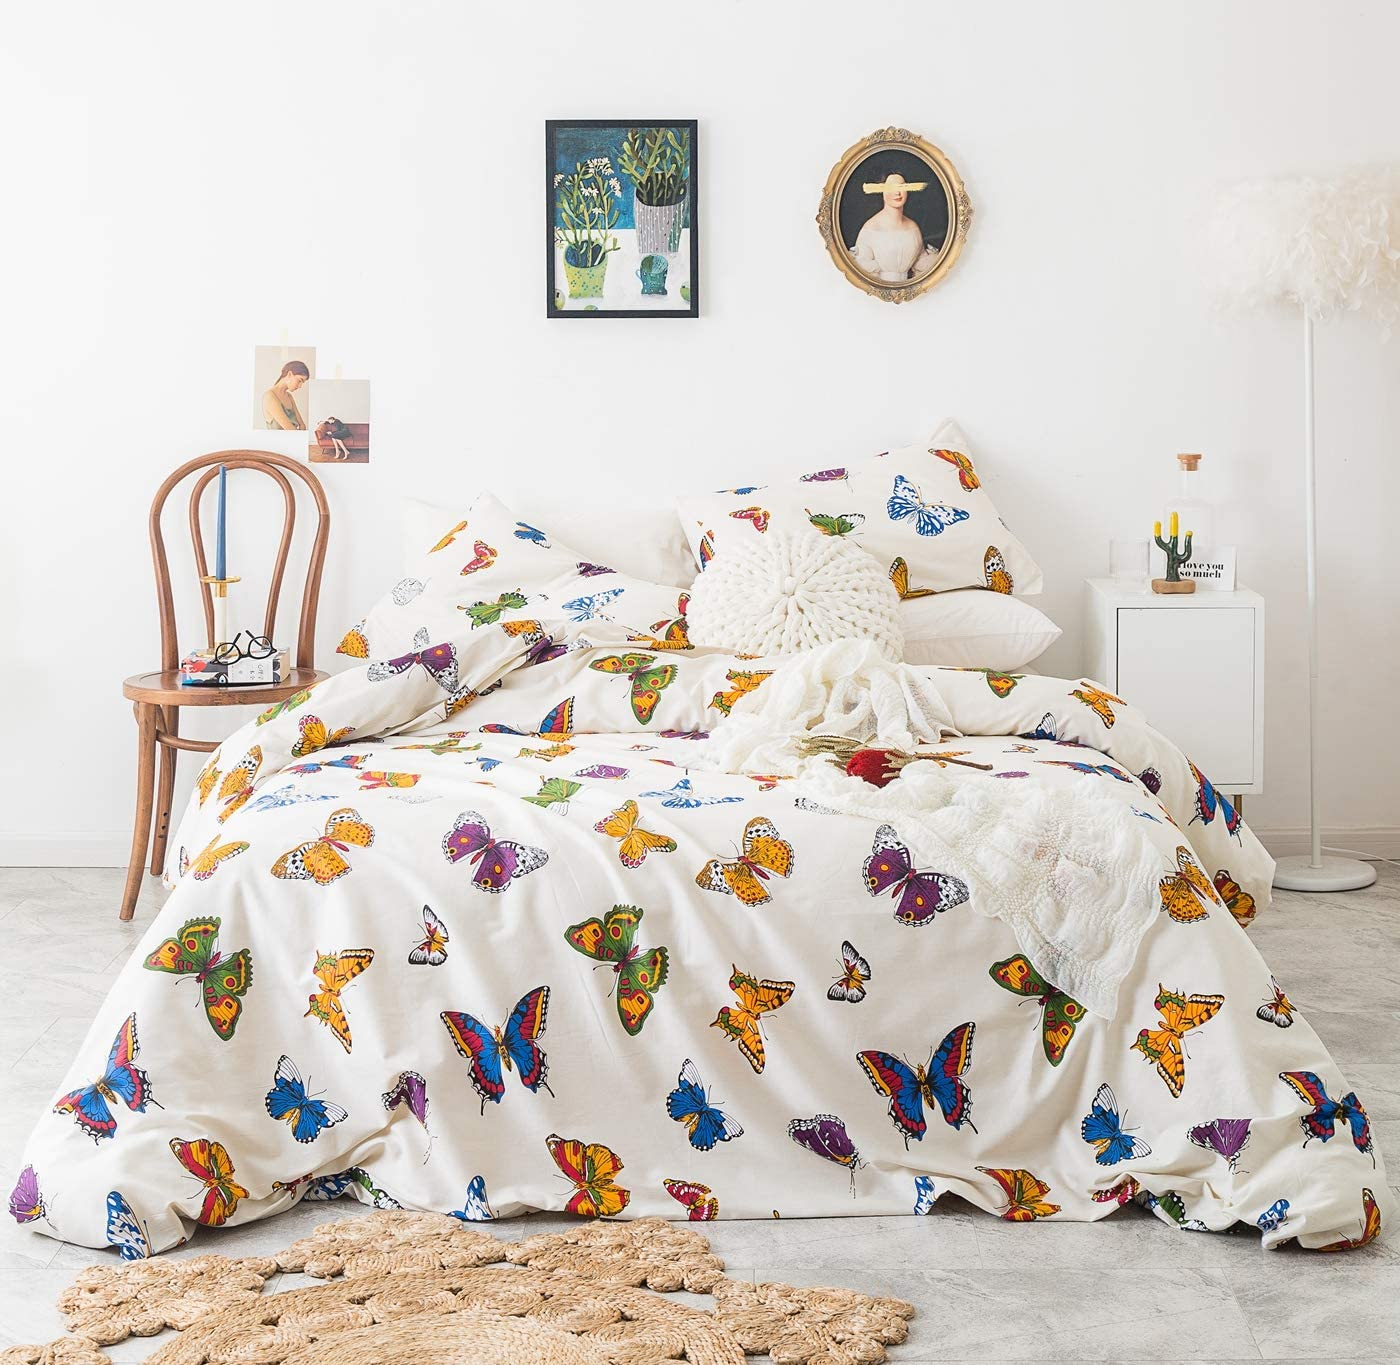 San Super sale Francisco Mall YuHeGuoJi 3 Pieces Duvet Cover Set 100% Bu Cotton Boho Size King